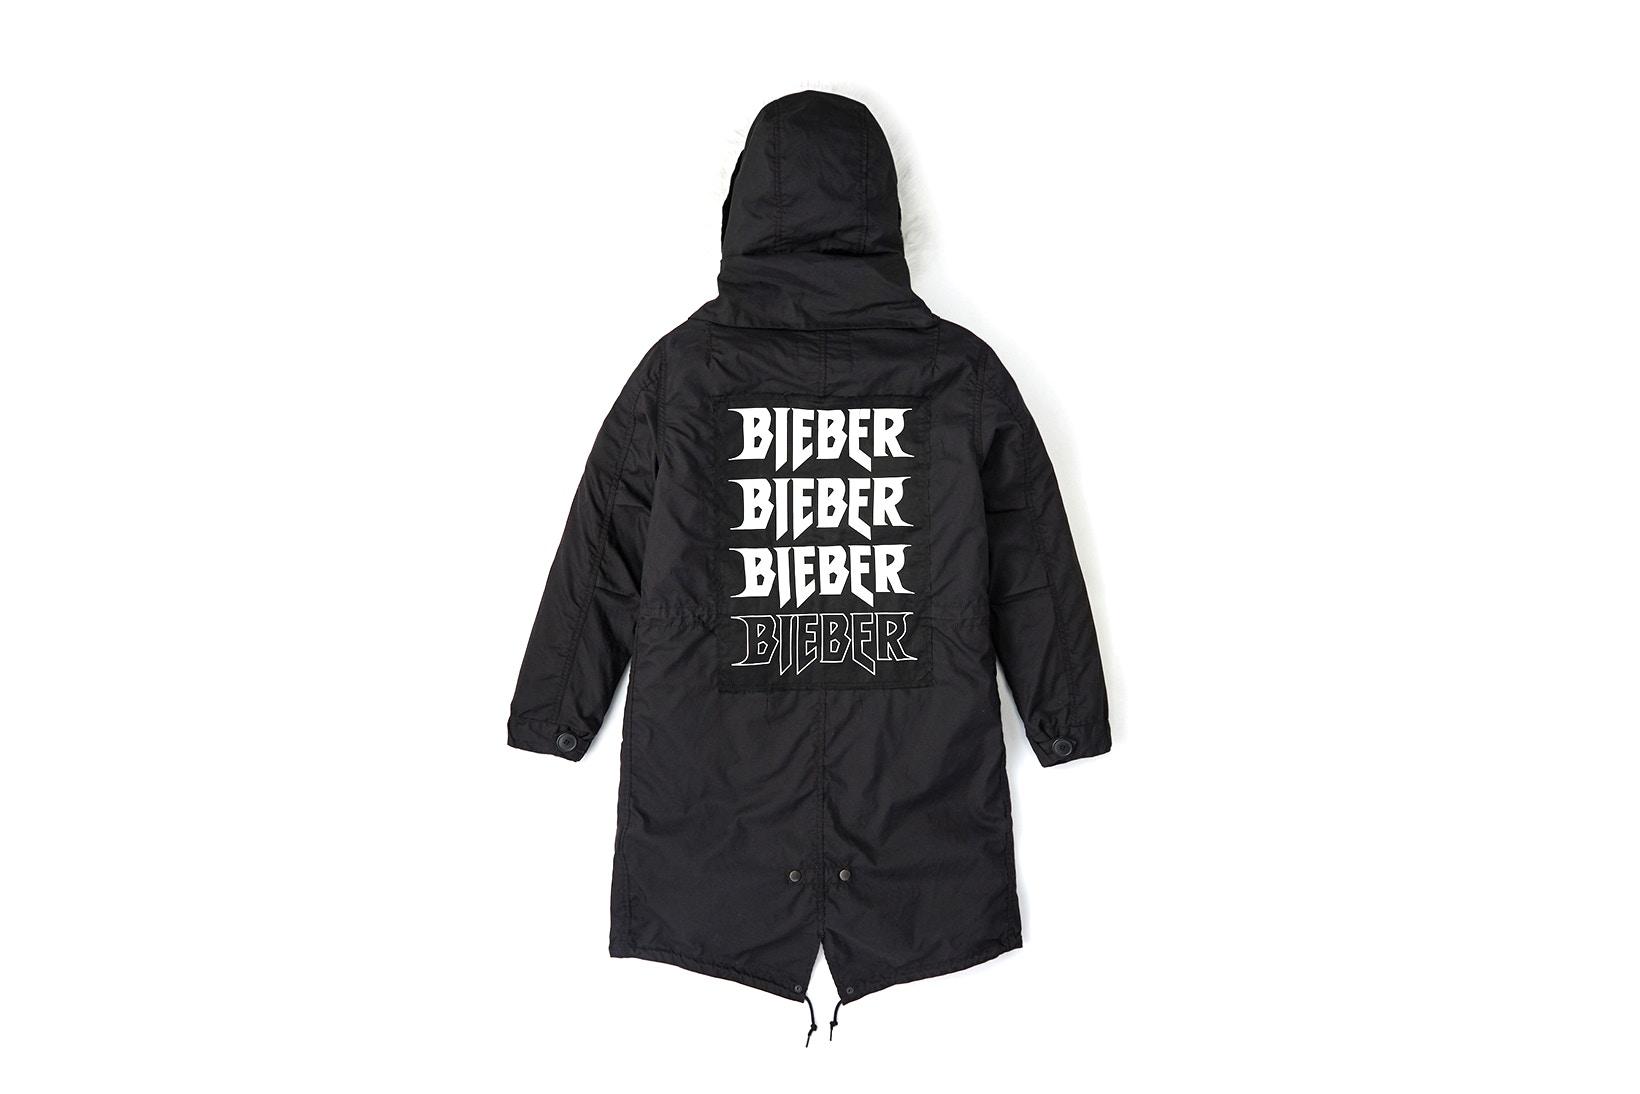 Justin Bieber又有新动态联名承包你的冬装